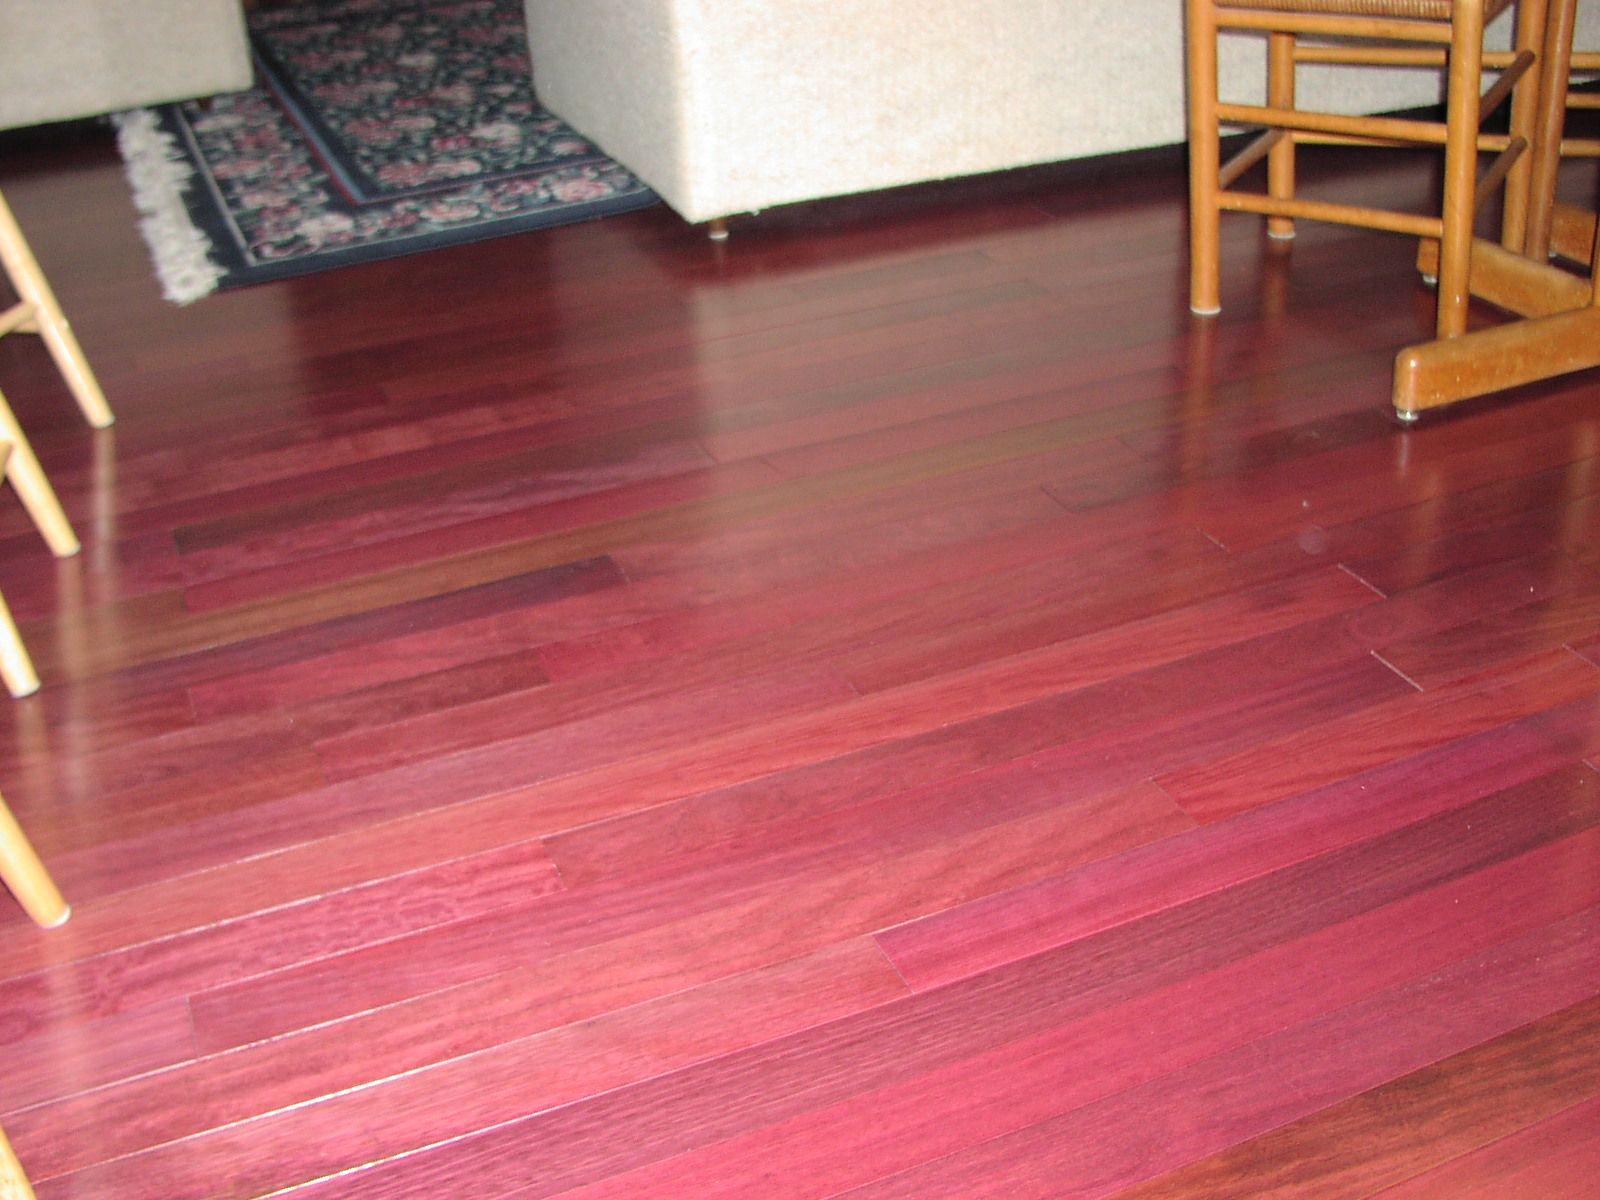 My new obsession  purpleheart wood. My new obsession  purpleheart wood    For the Home   Pinterest